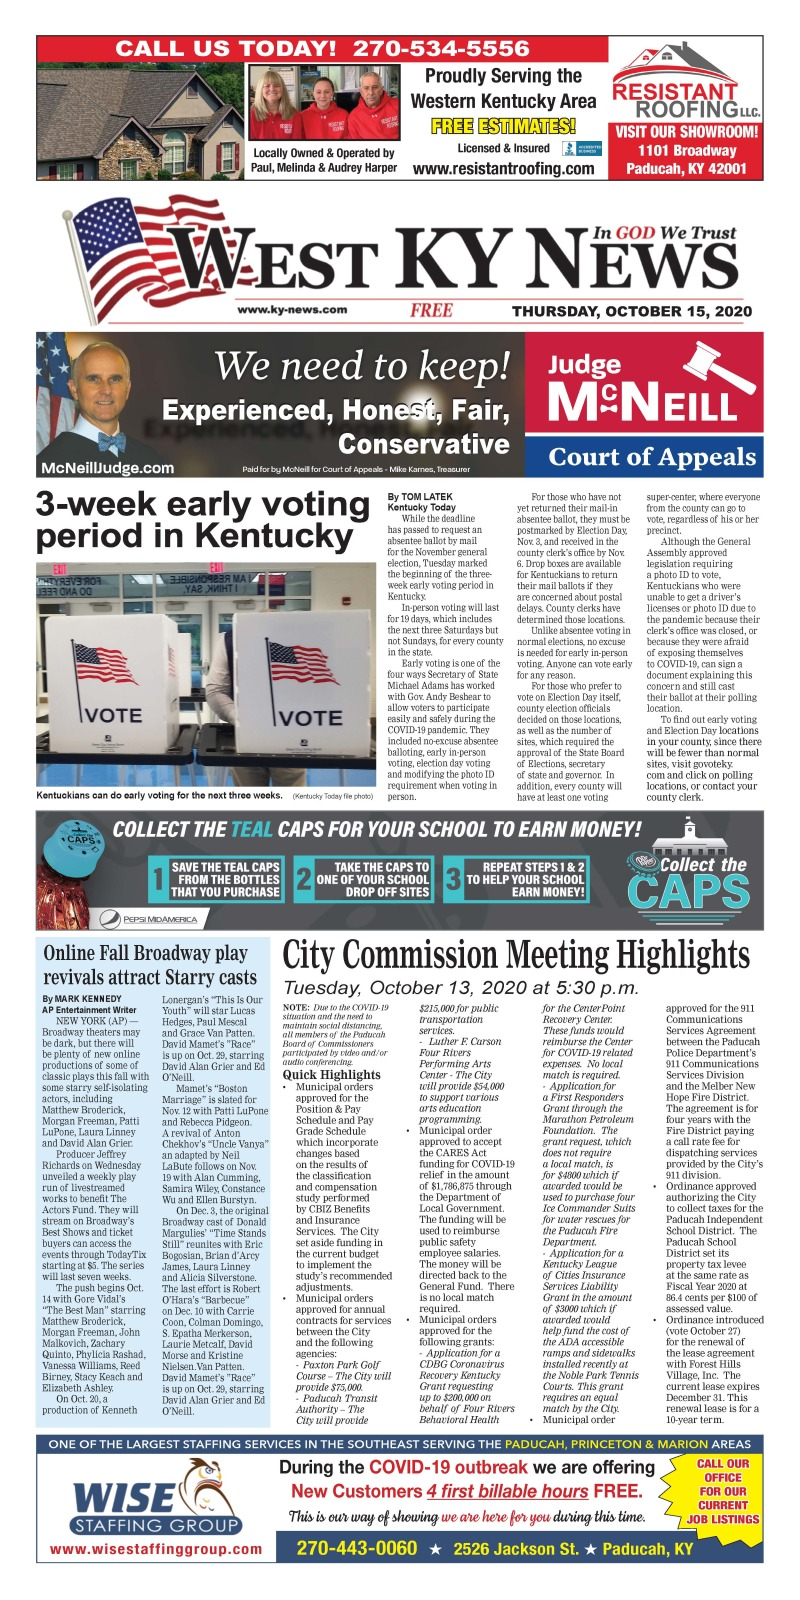 West KY News 10-15-20